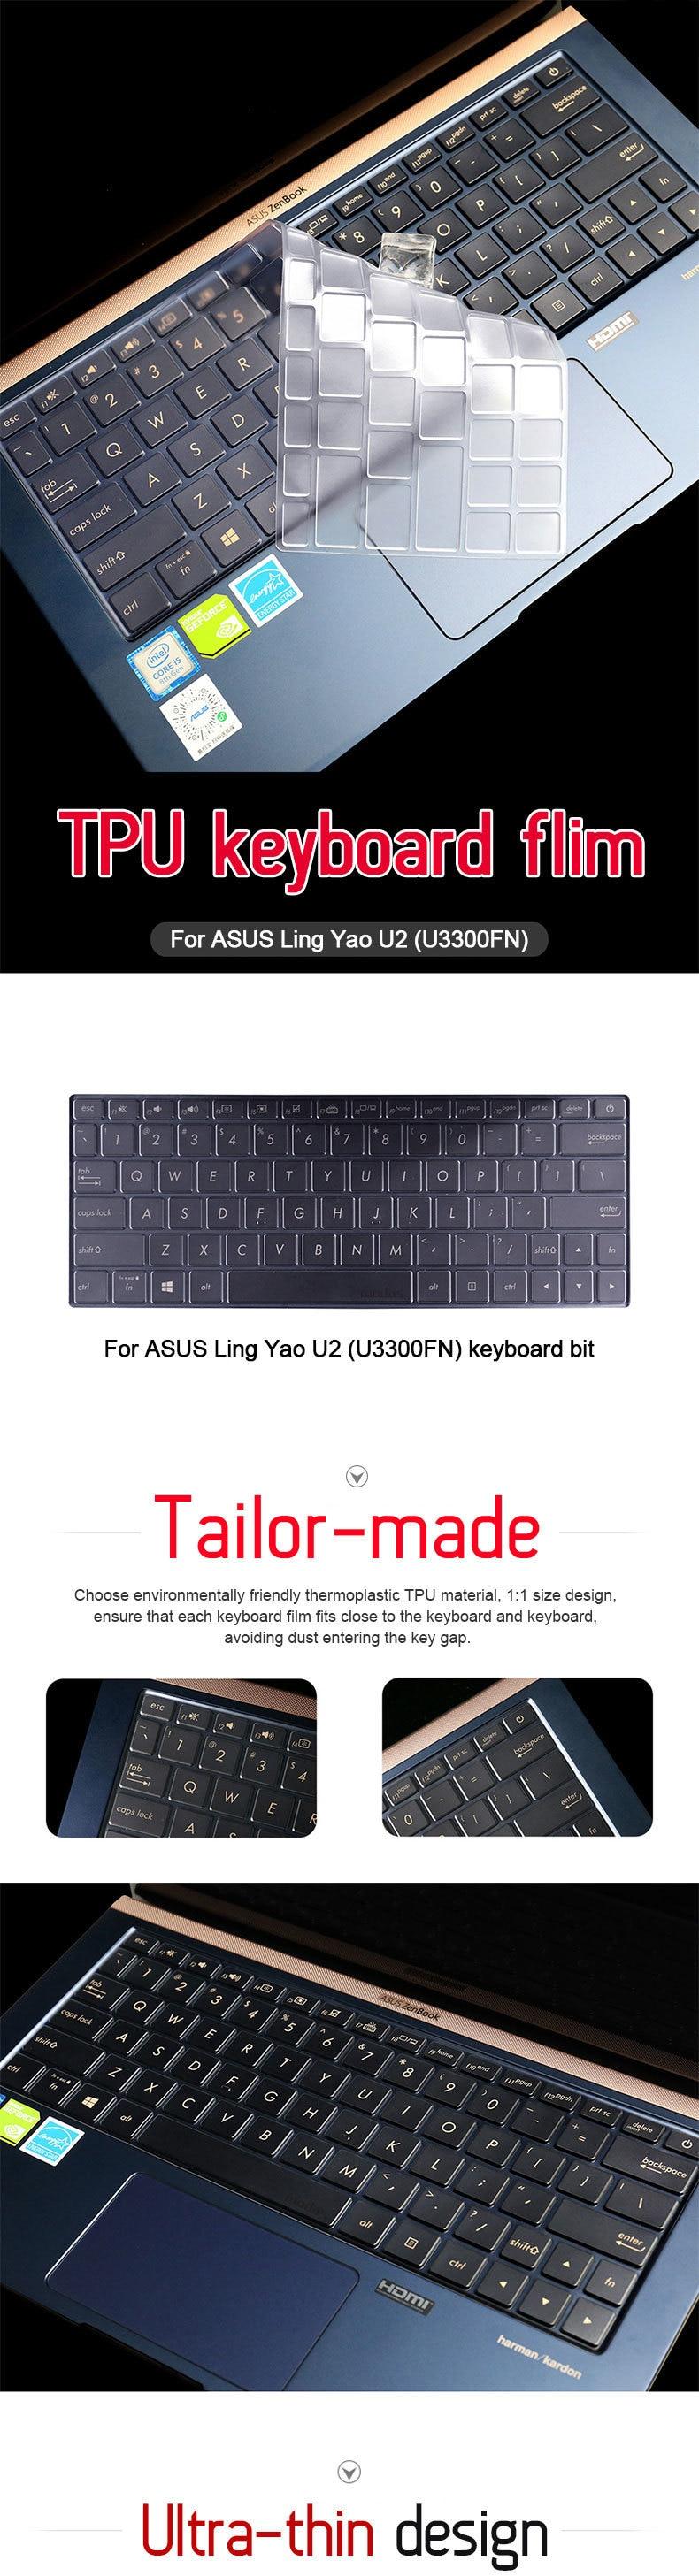 Laptop TPU keyboard protector film cover For ASUS U3300FN U2 Generation  Invisible waterproof Keyboard Protective membrane